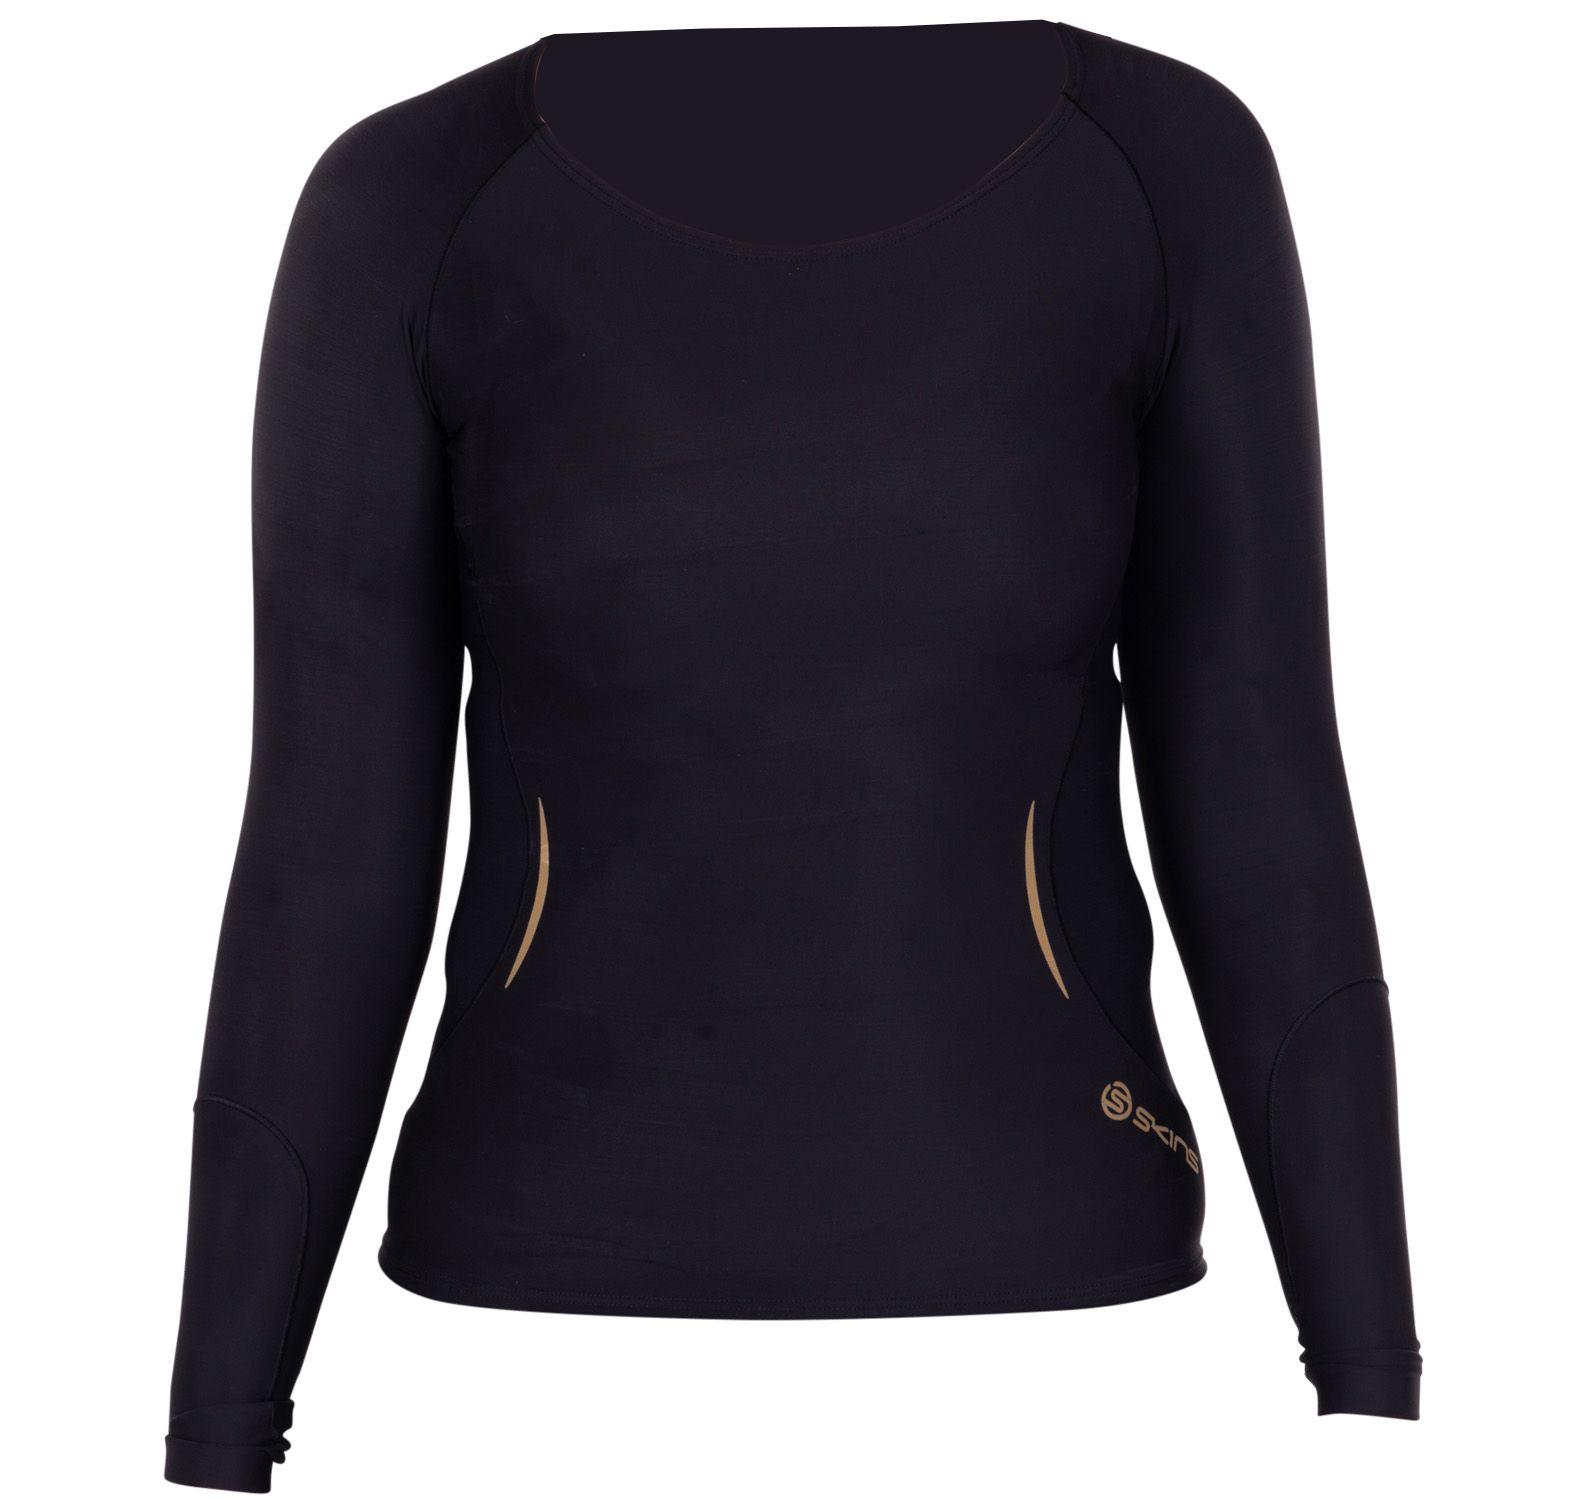 a400 womens top long sleeve, black/gold, xs,  skins